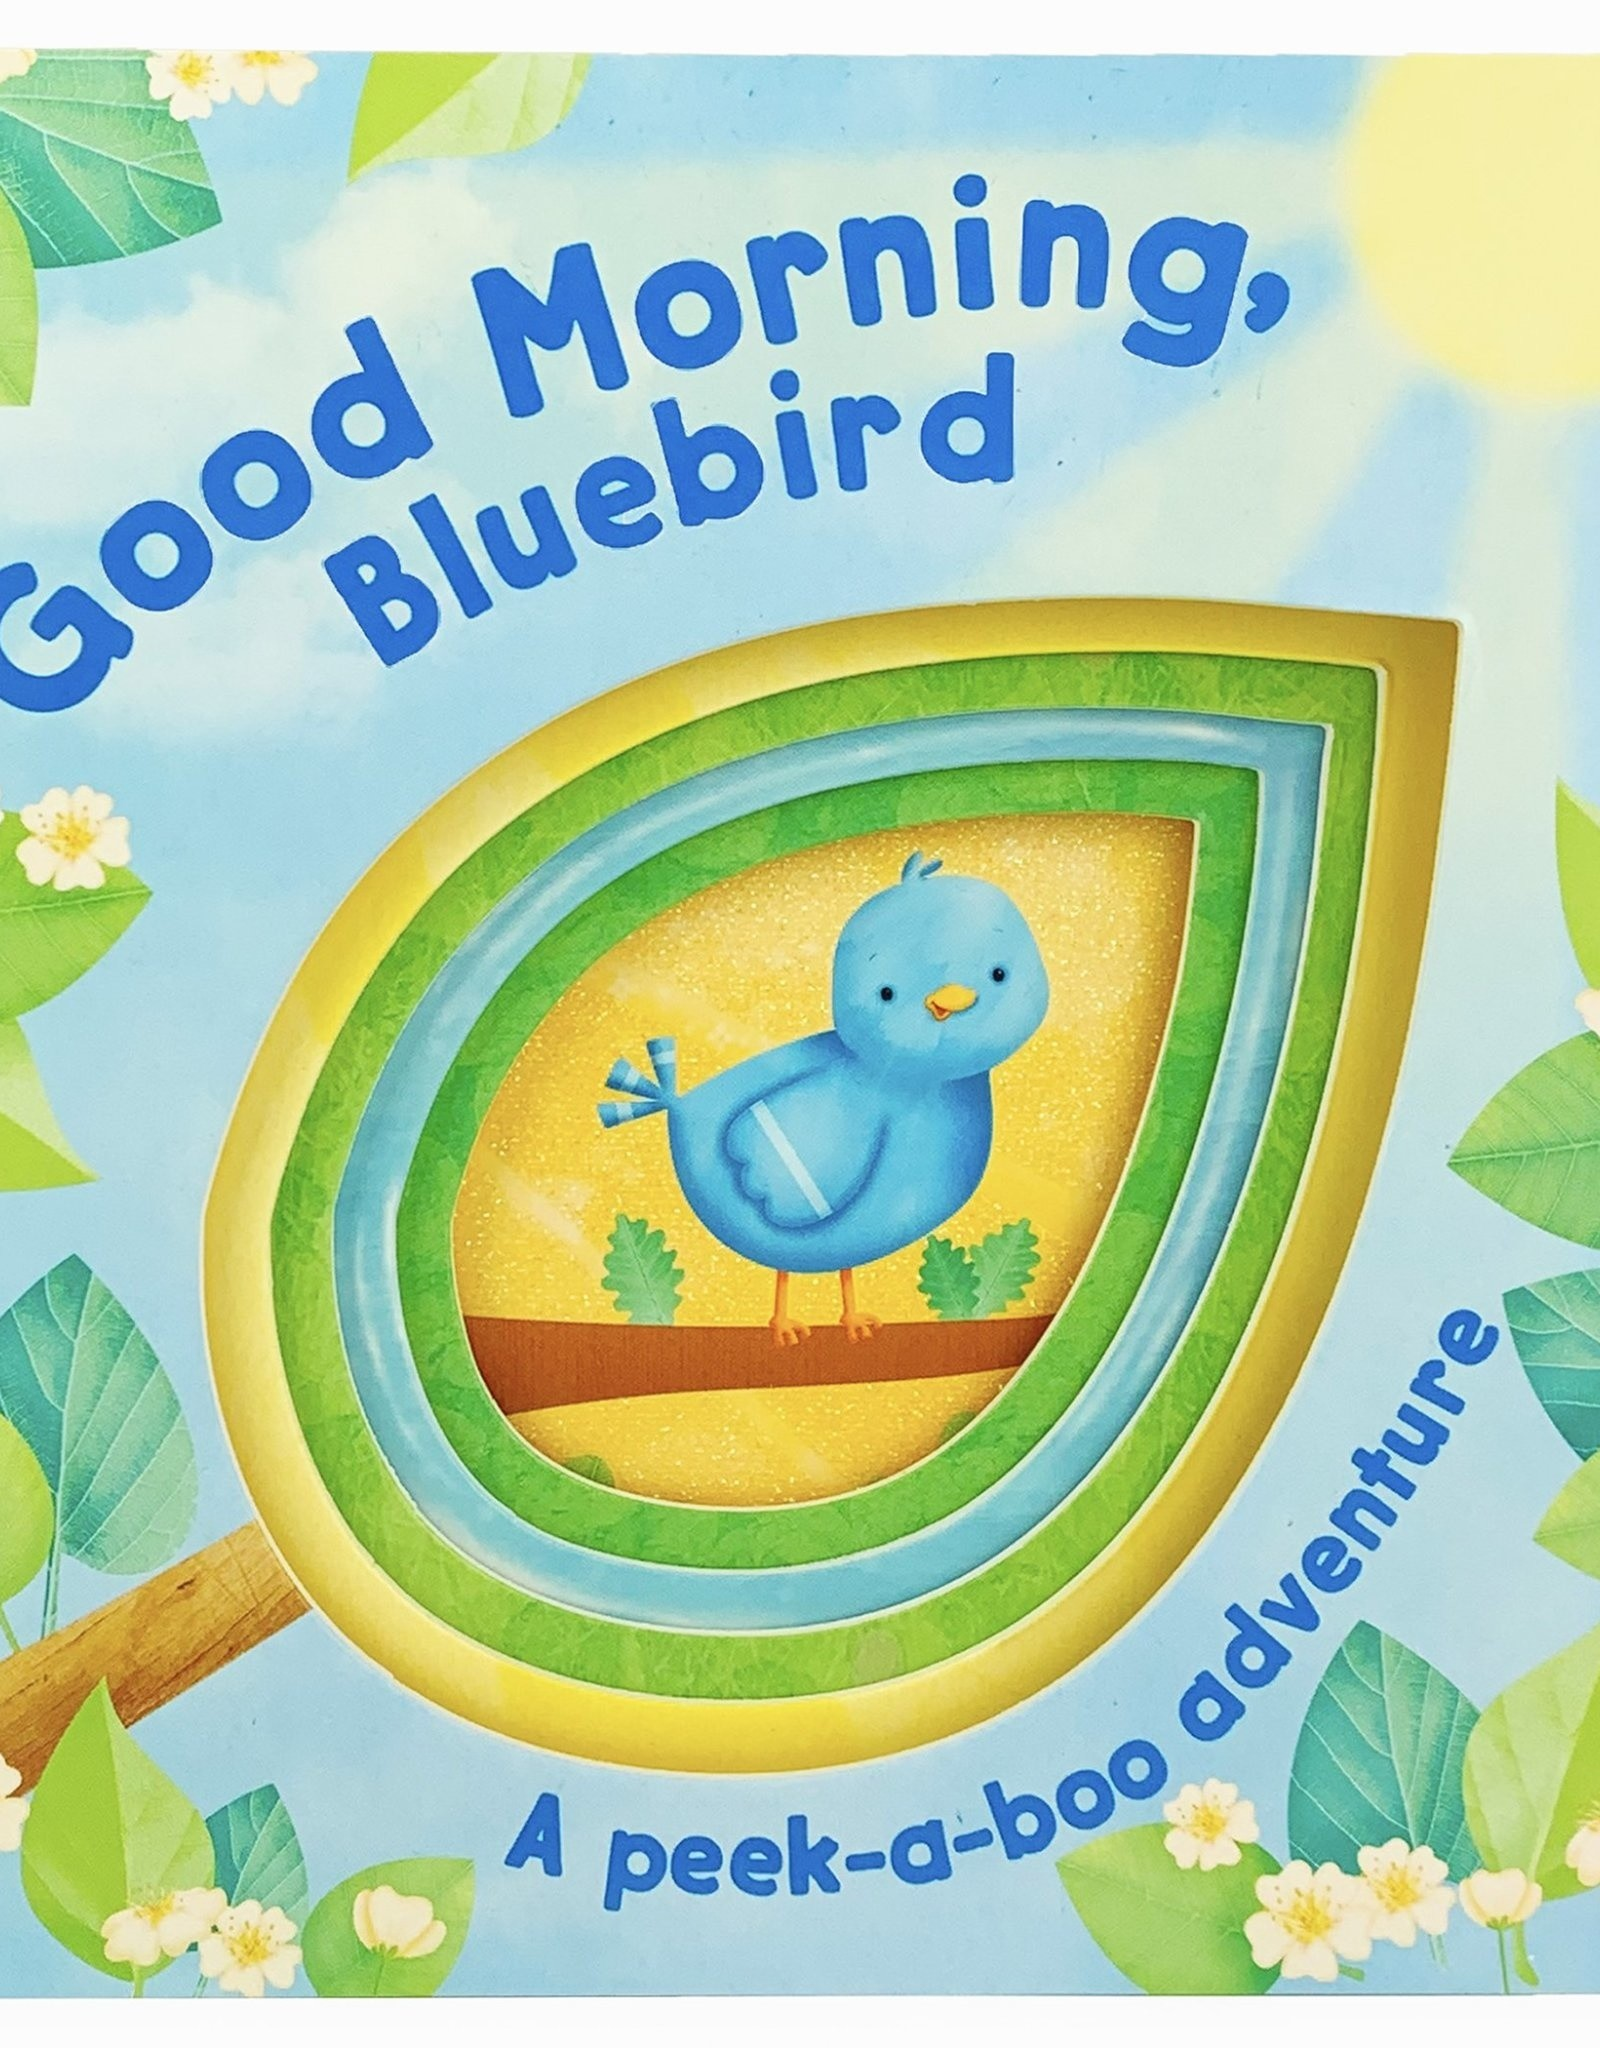 Cottage Door Press Good Morning, Bluebird